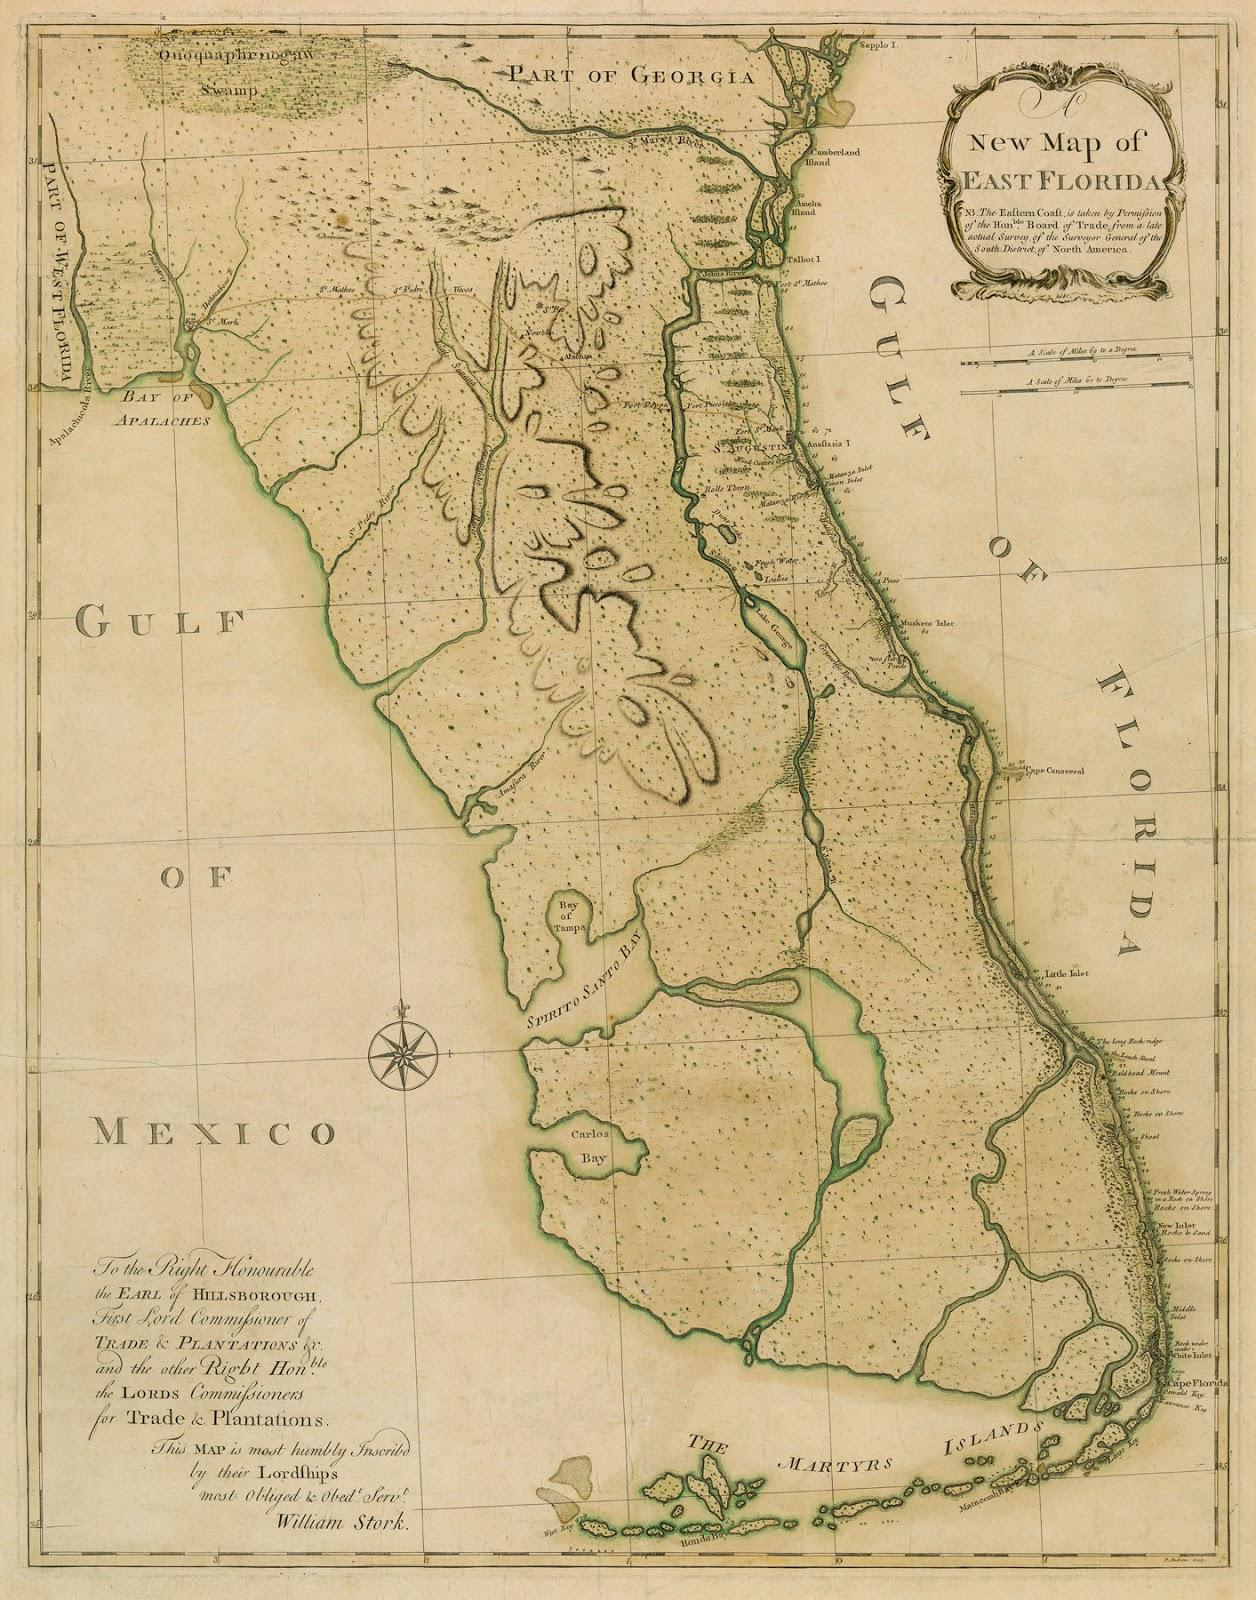 Tampa Bay History Center Artifact Spotlight William Storks - Map of east florida